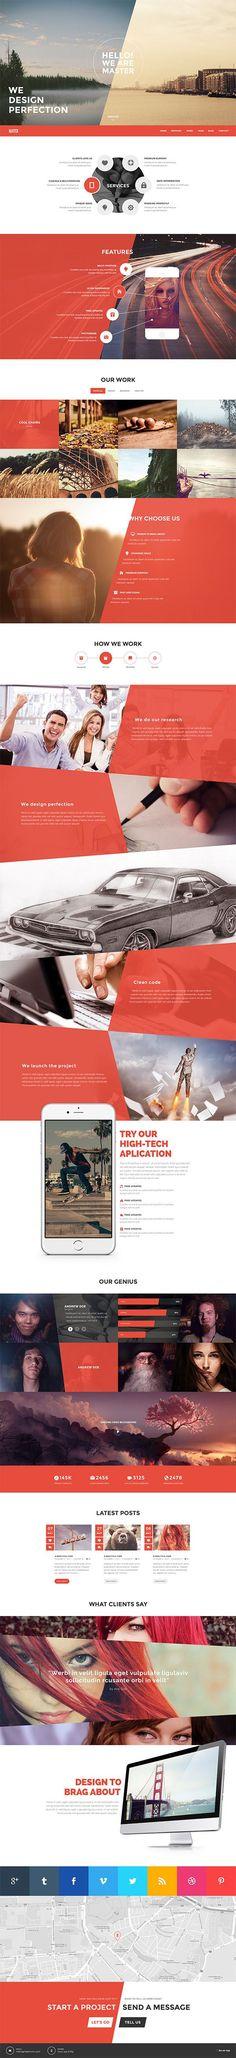 Master - Onepage Portfolio Theme by Qodepixel #wordpress #themeforest #website…